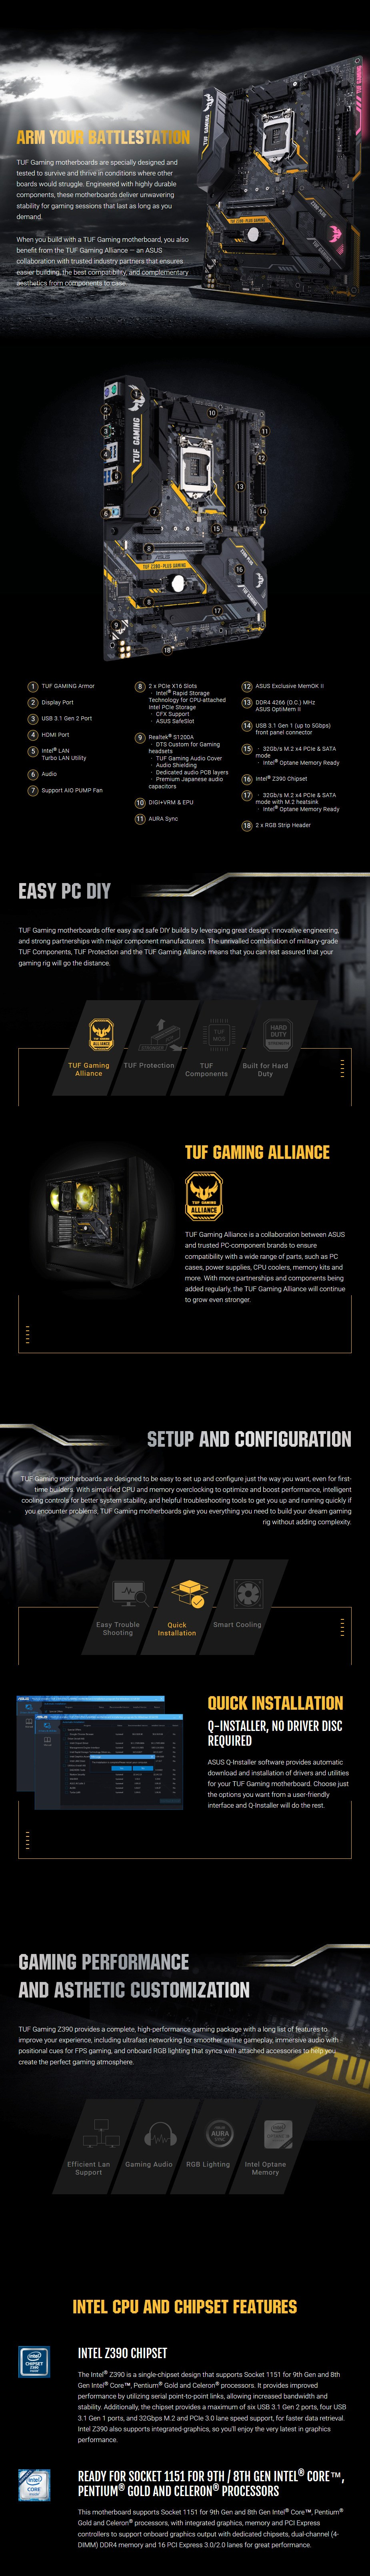 ASUS TUF Z390-PLUS GAMING LGA 1151 ATX Motherboard - Desktop Overview 1